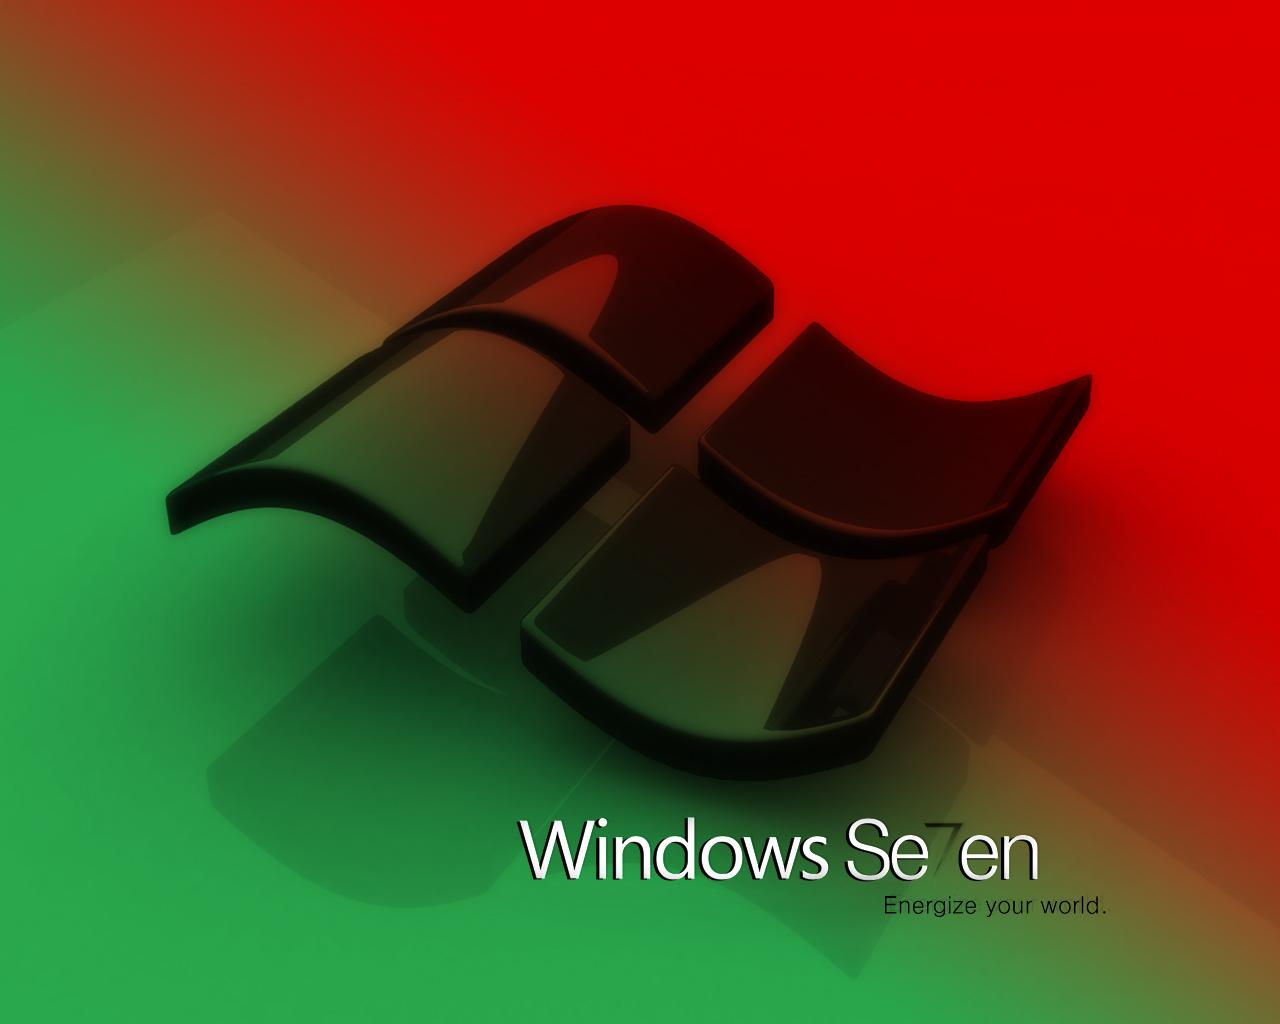 Windows Seven (7)